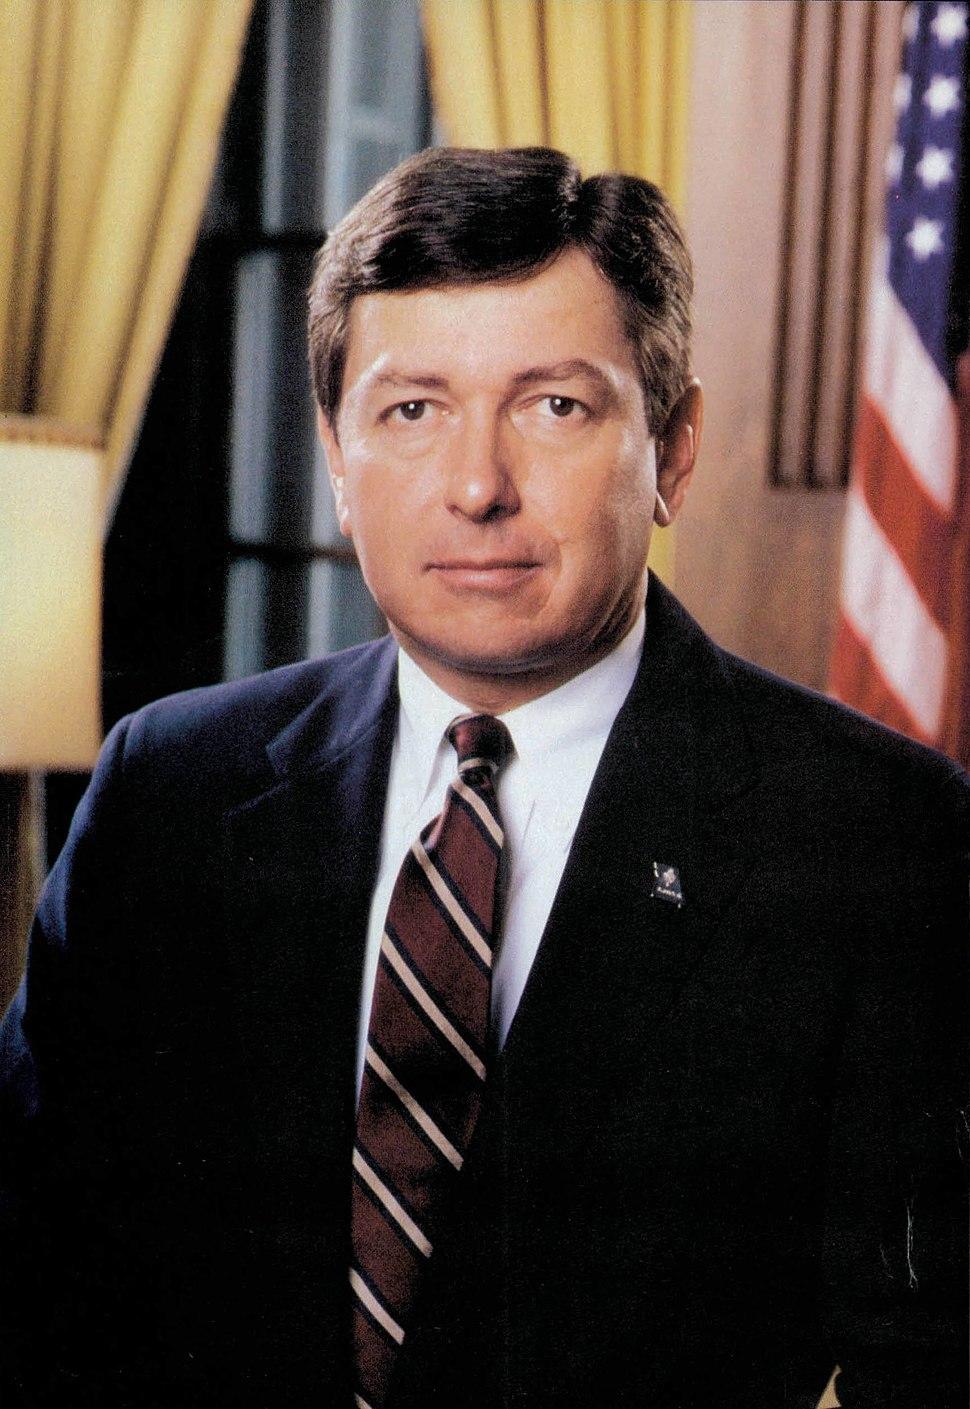 John Ashcroft official photo as Governor